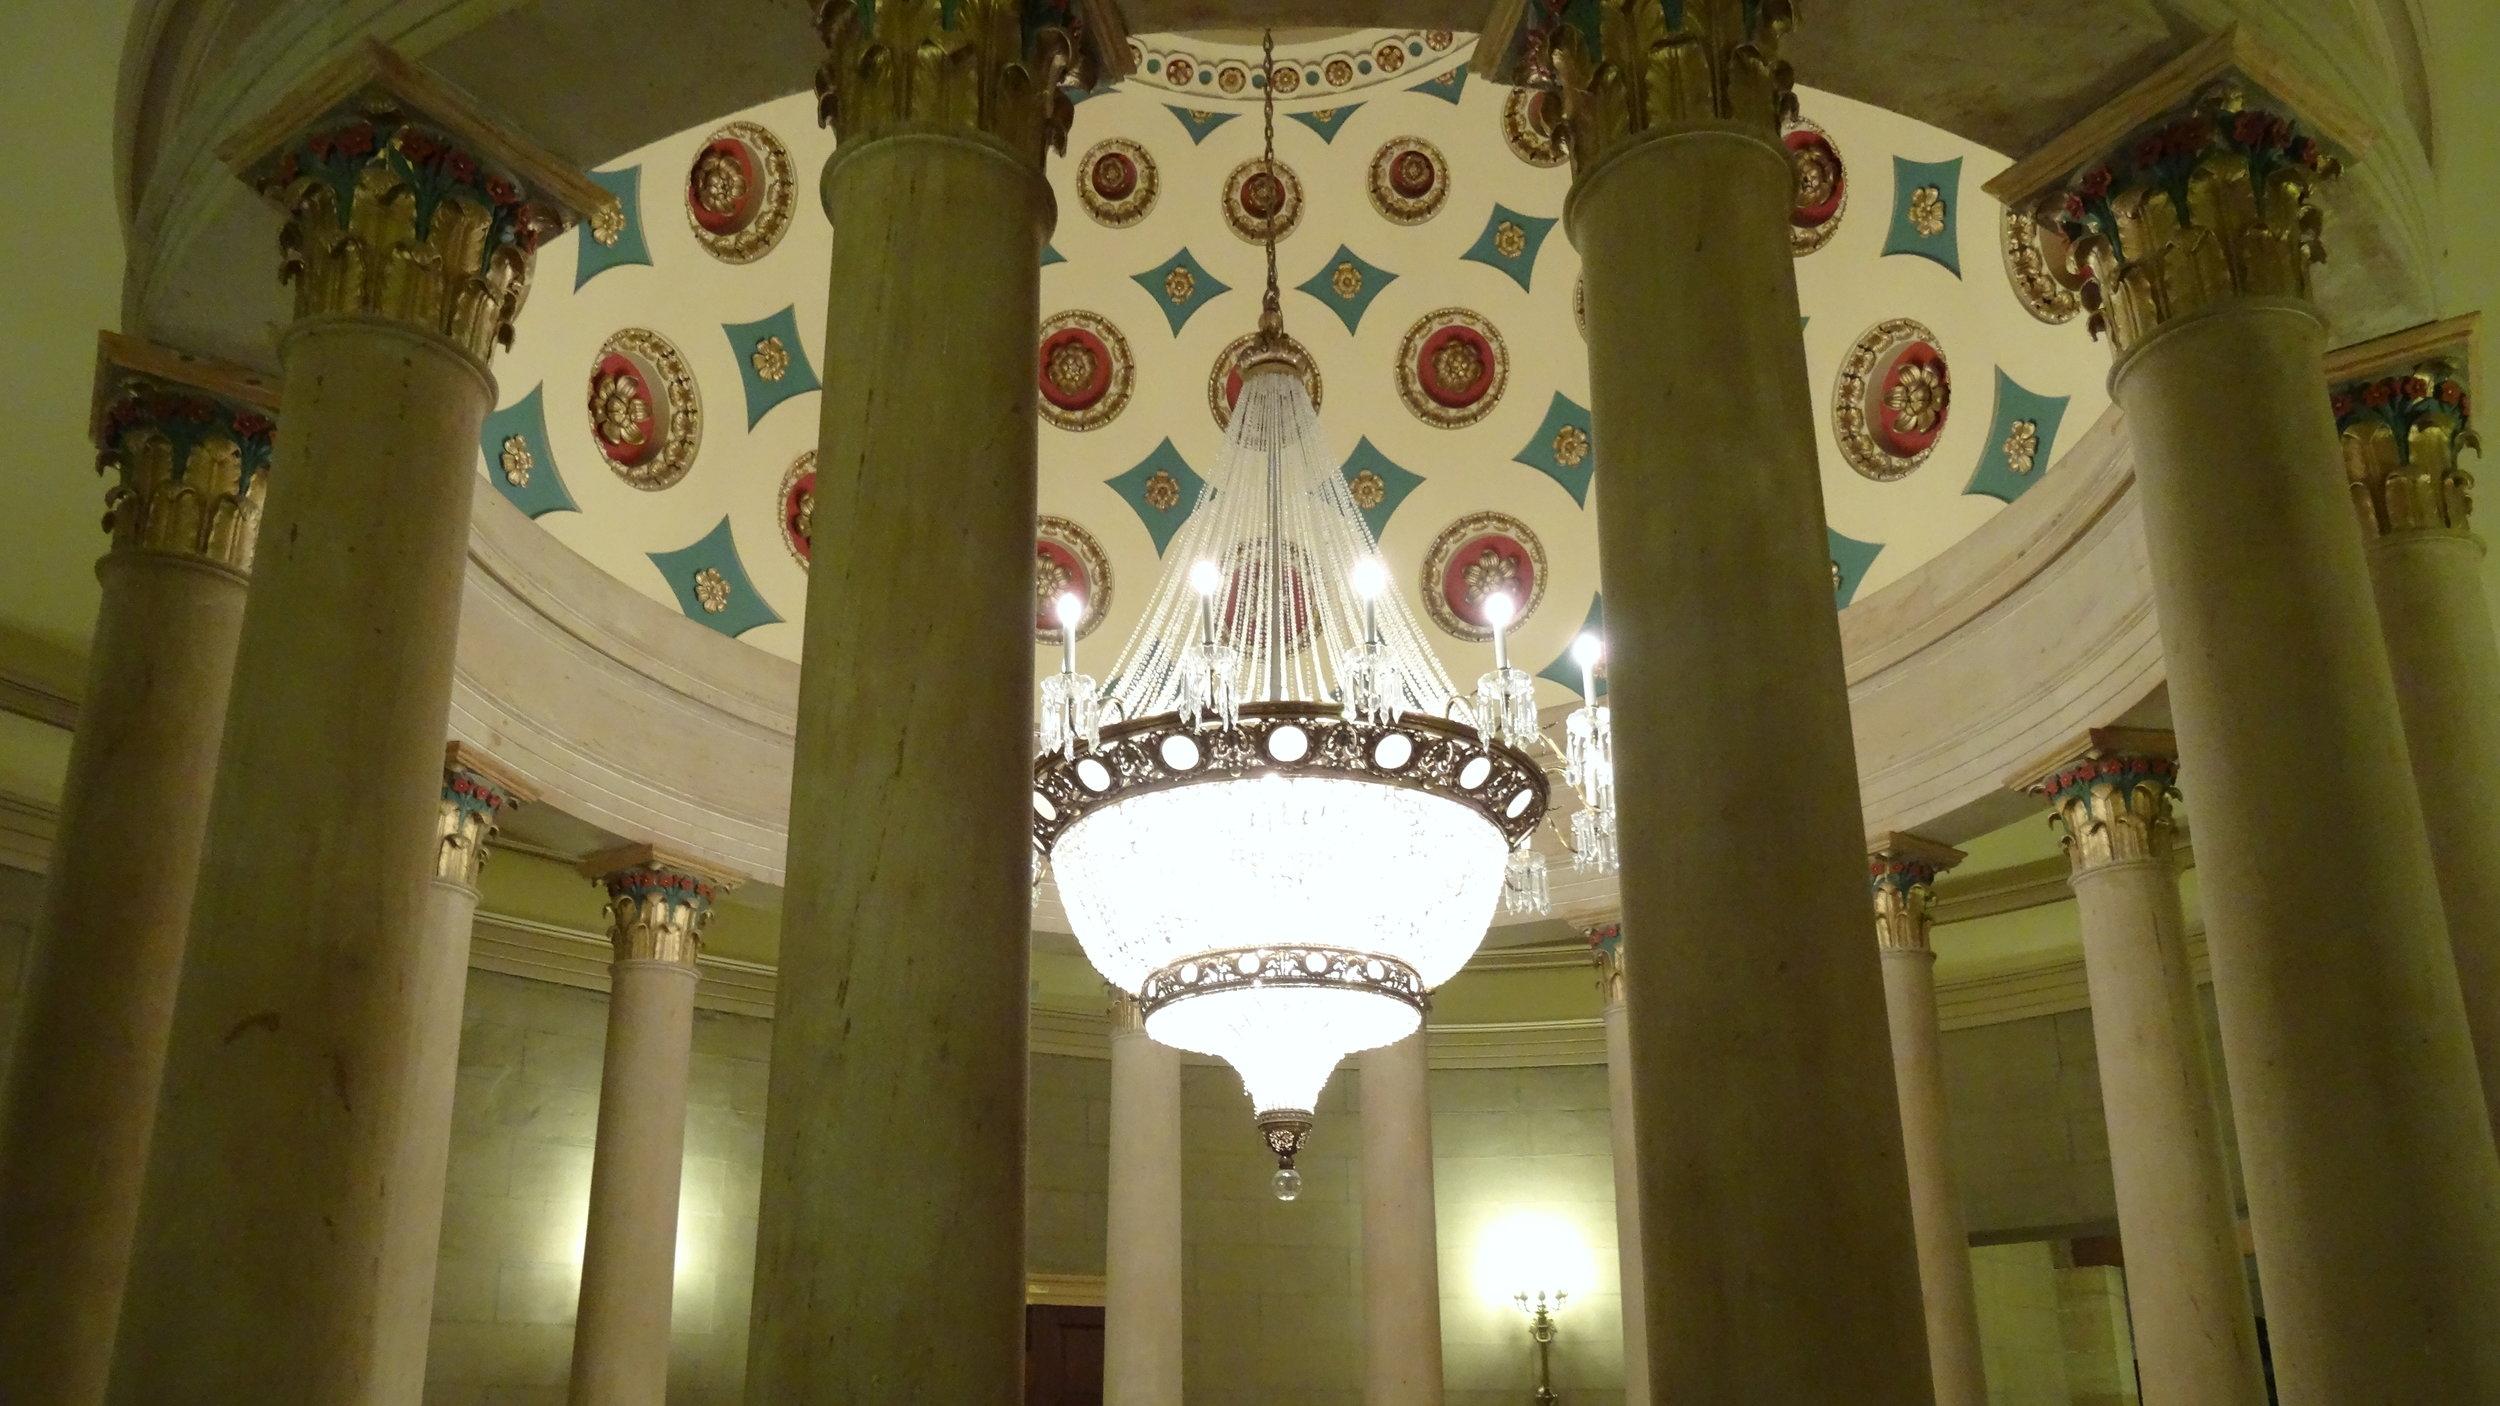 Senate Rotunda Chandelier